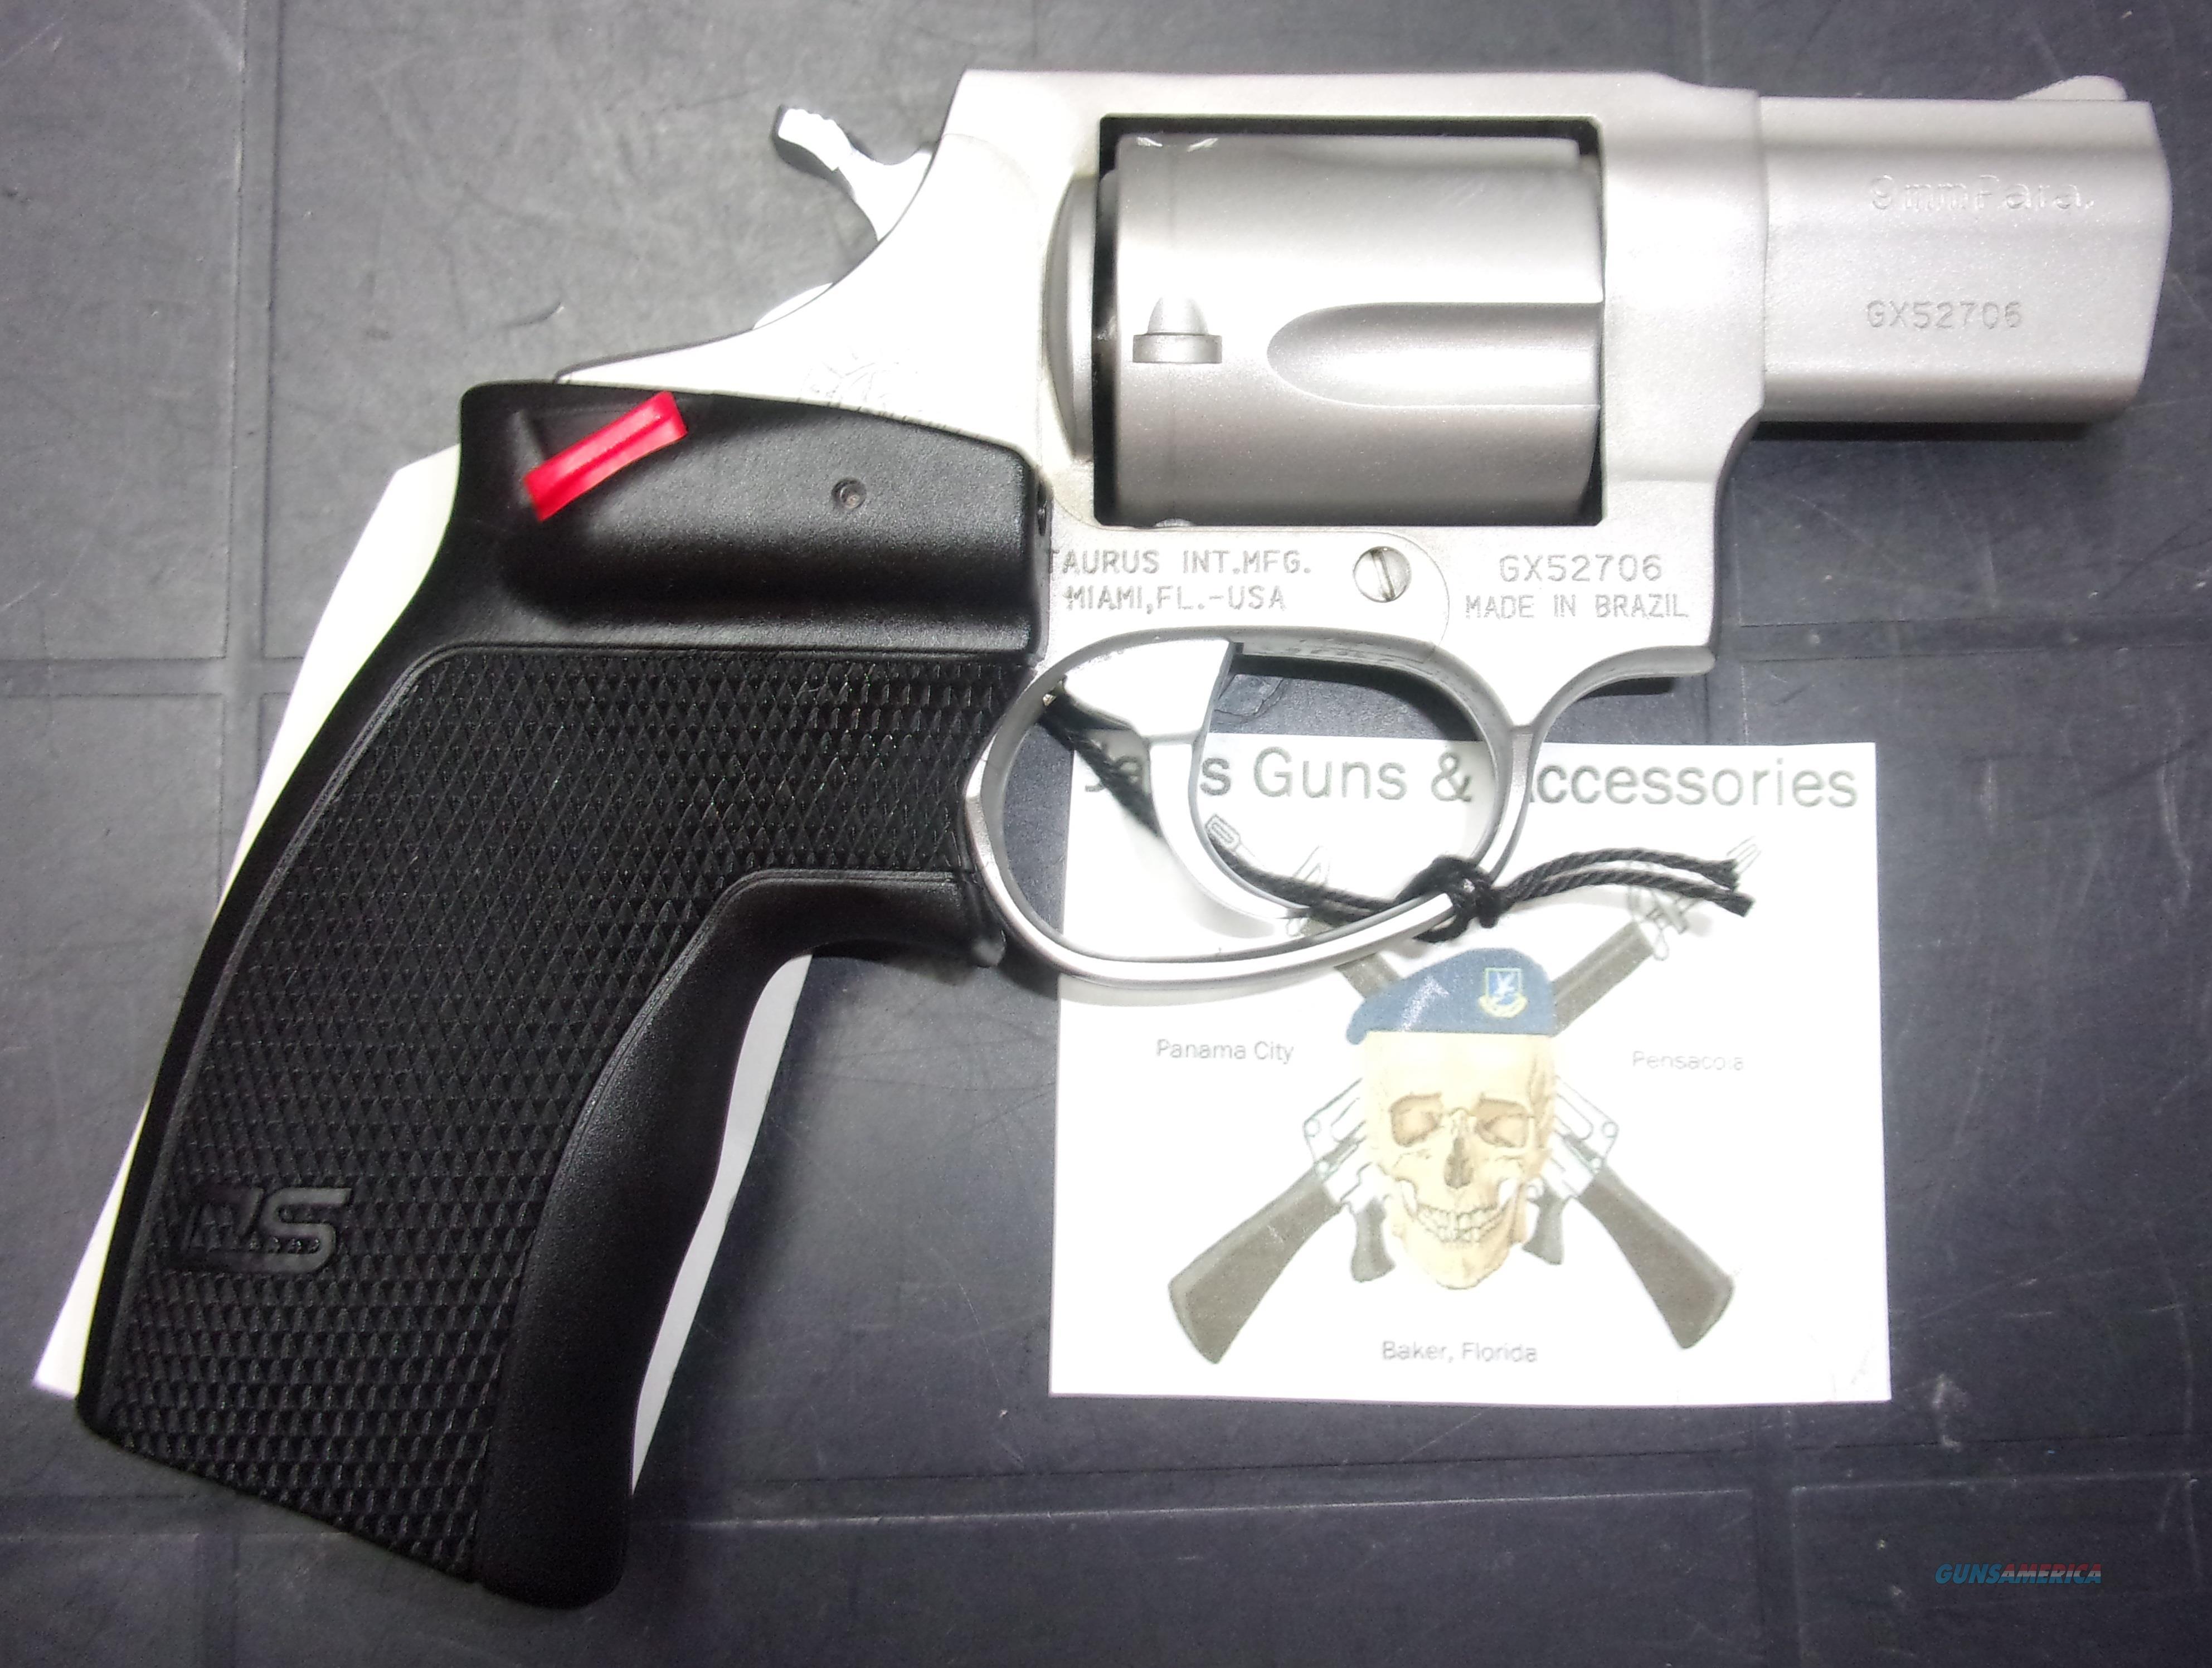 Taurus 905 w/Laser  Guns > Pistols > Taurus Pistols > Revolvers